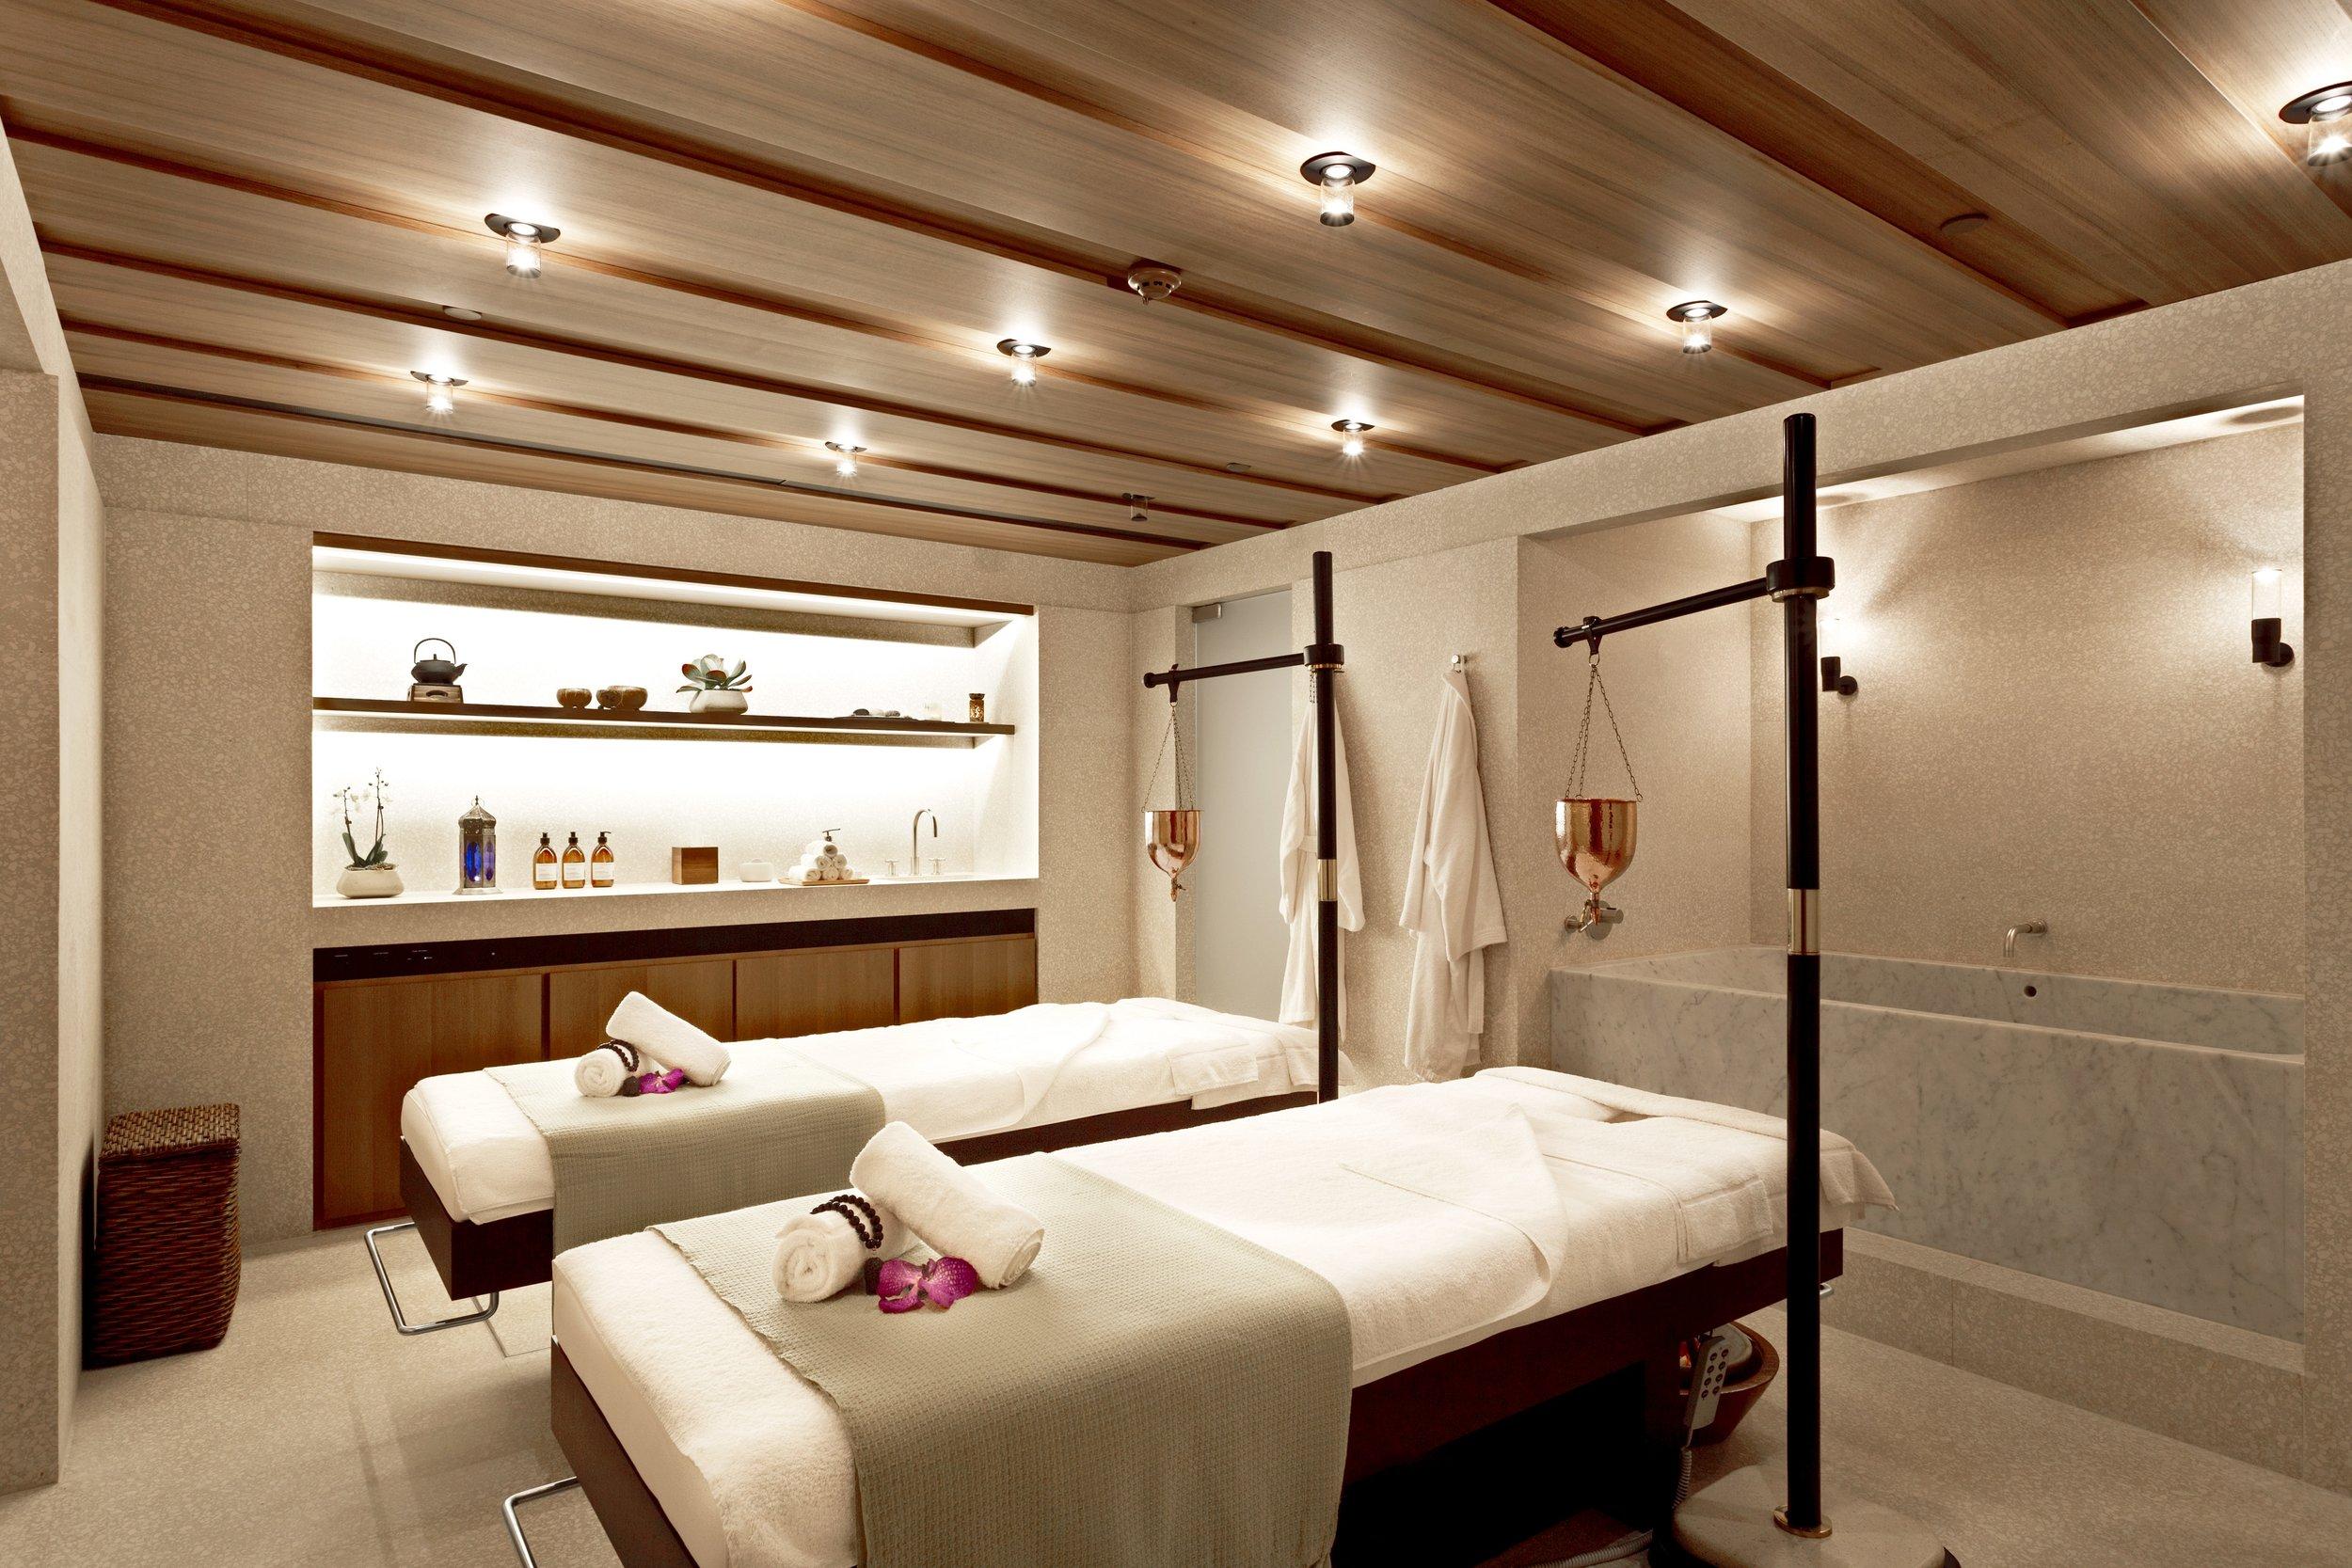 Hotel Cafe Royal - Akasha - Double Treatment Suite.jpg